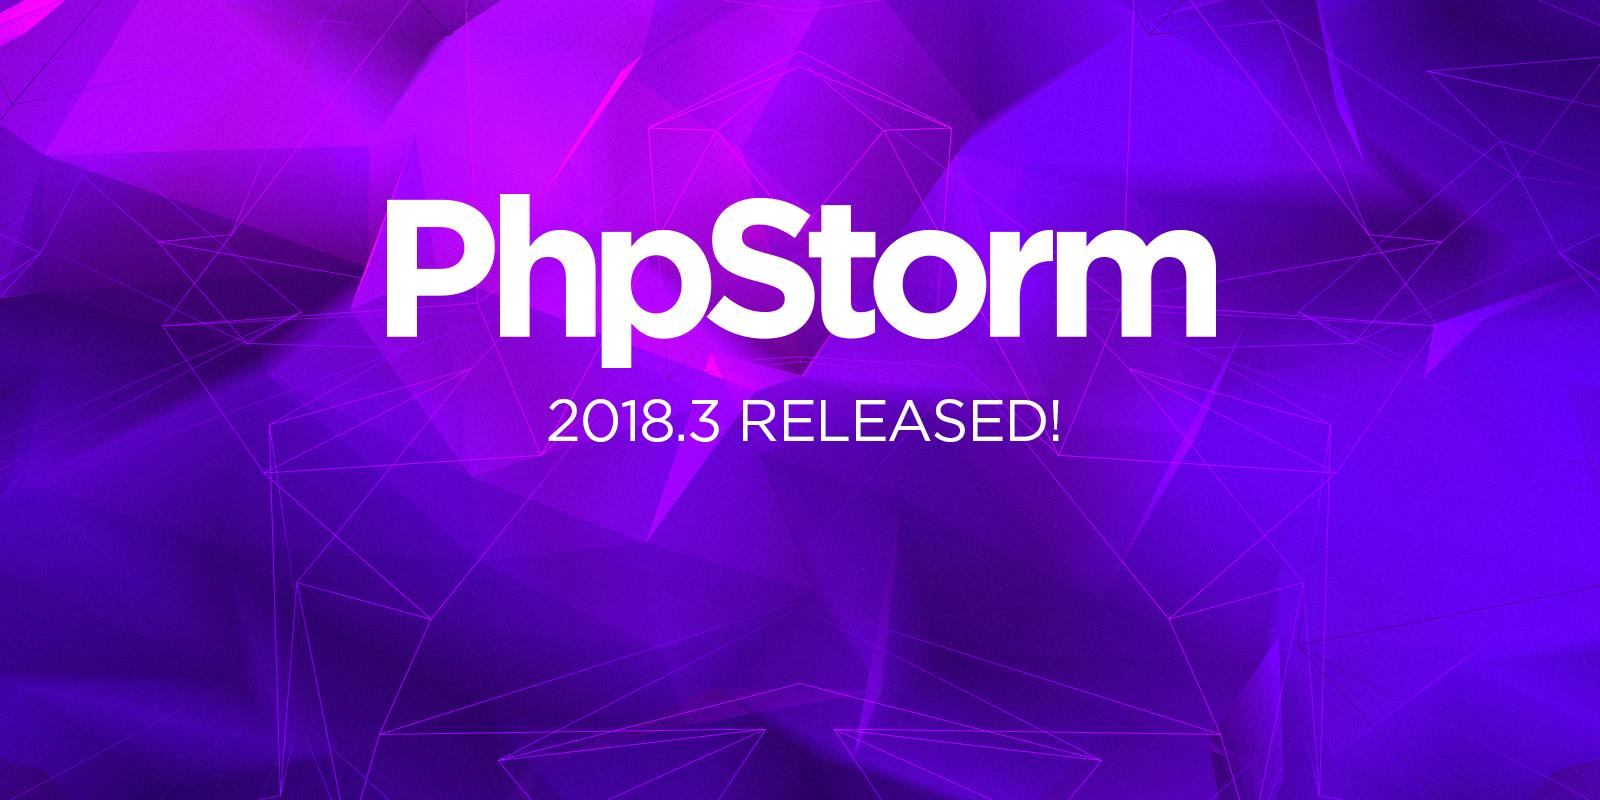 PhpStorm 2018.3